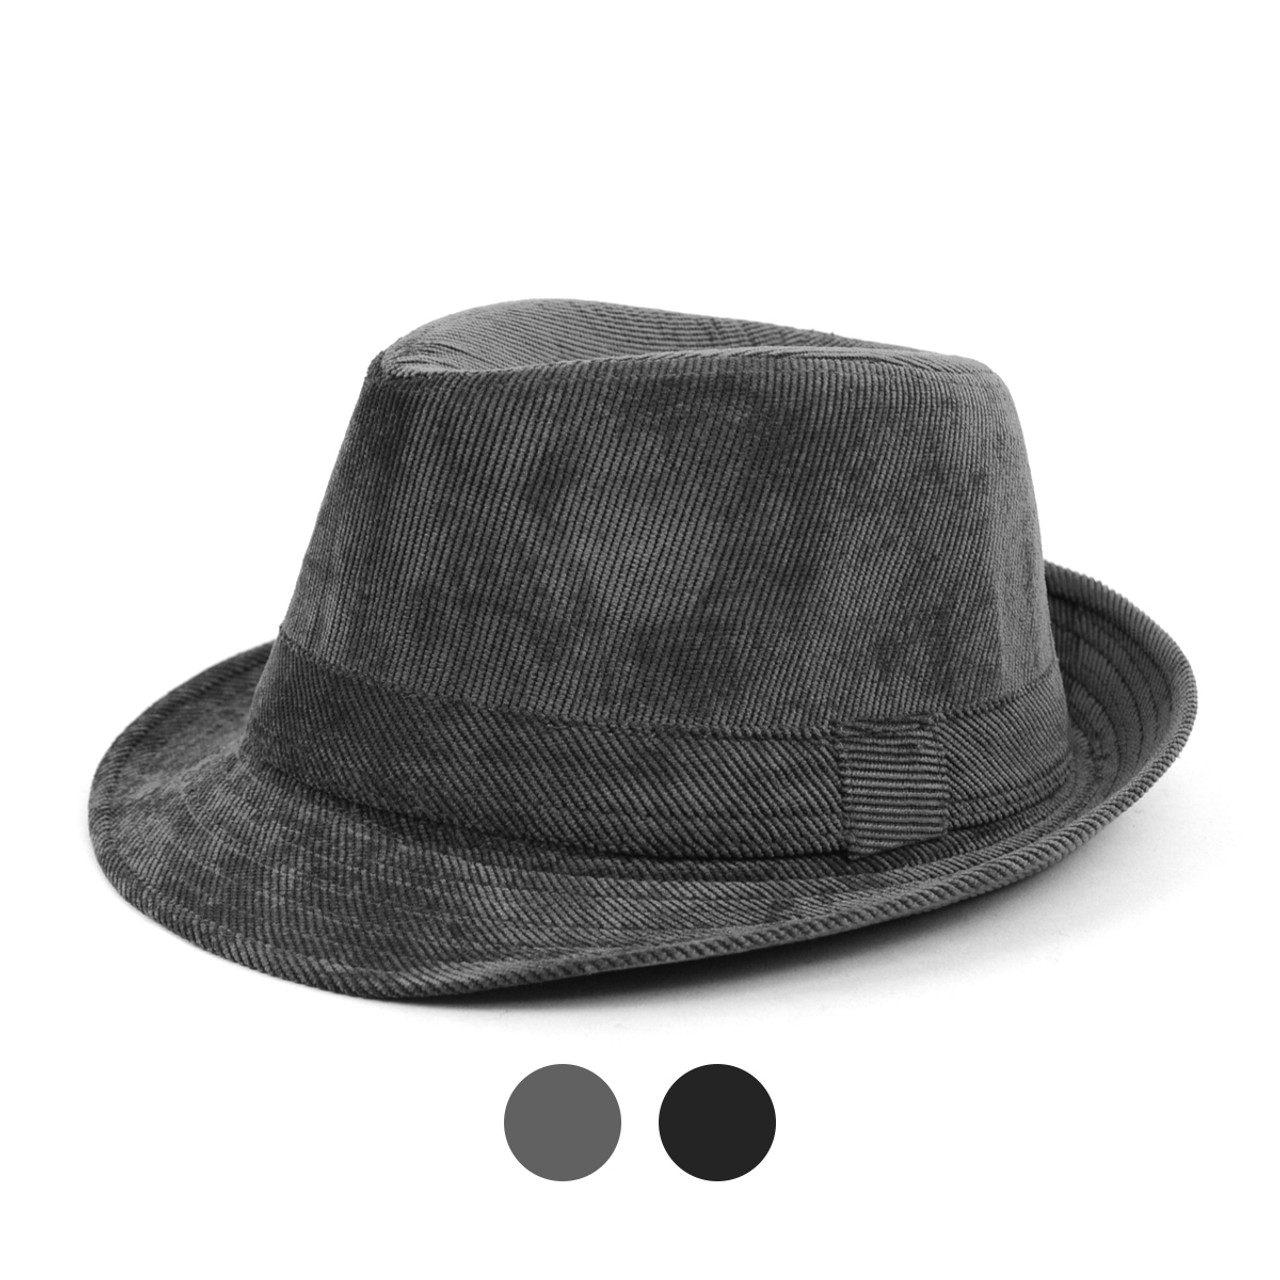 6pcs Two Sizes Boy s Fall Winter Corduroy Fedora Hats - BF0334 6c94c81d2b6